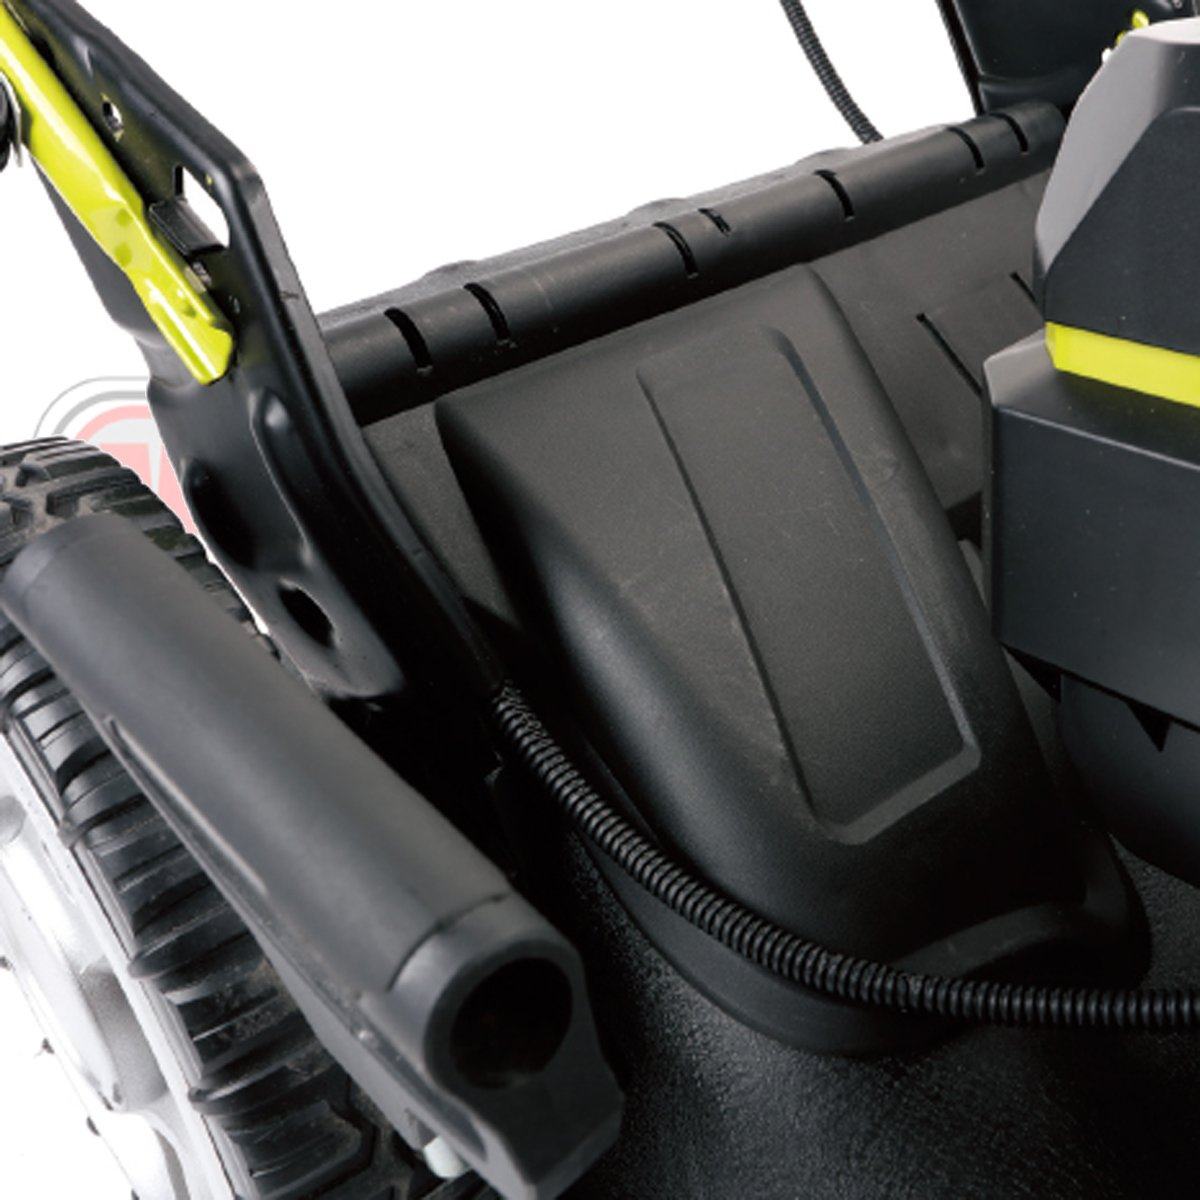 Cortacesped de bateria robusto potente G-Force XR 120 LM 53 SP